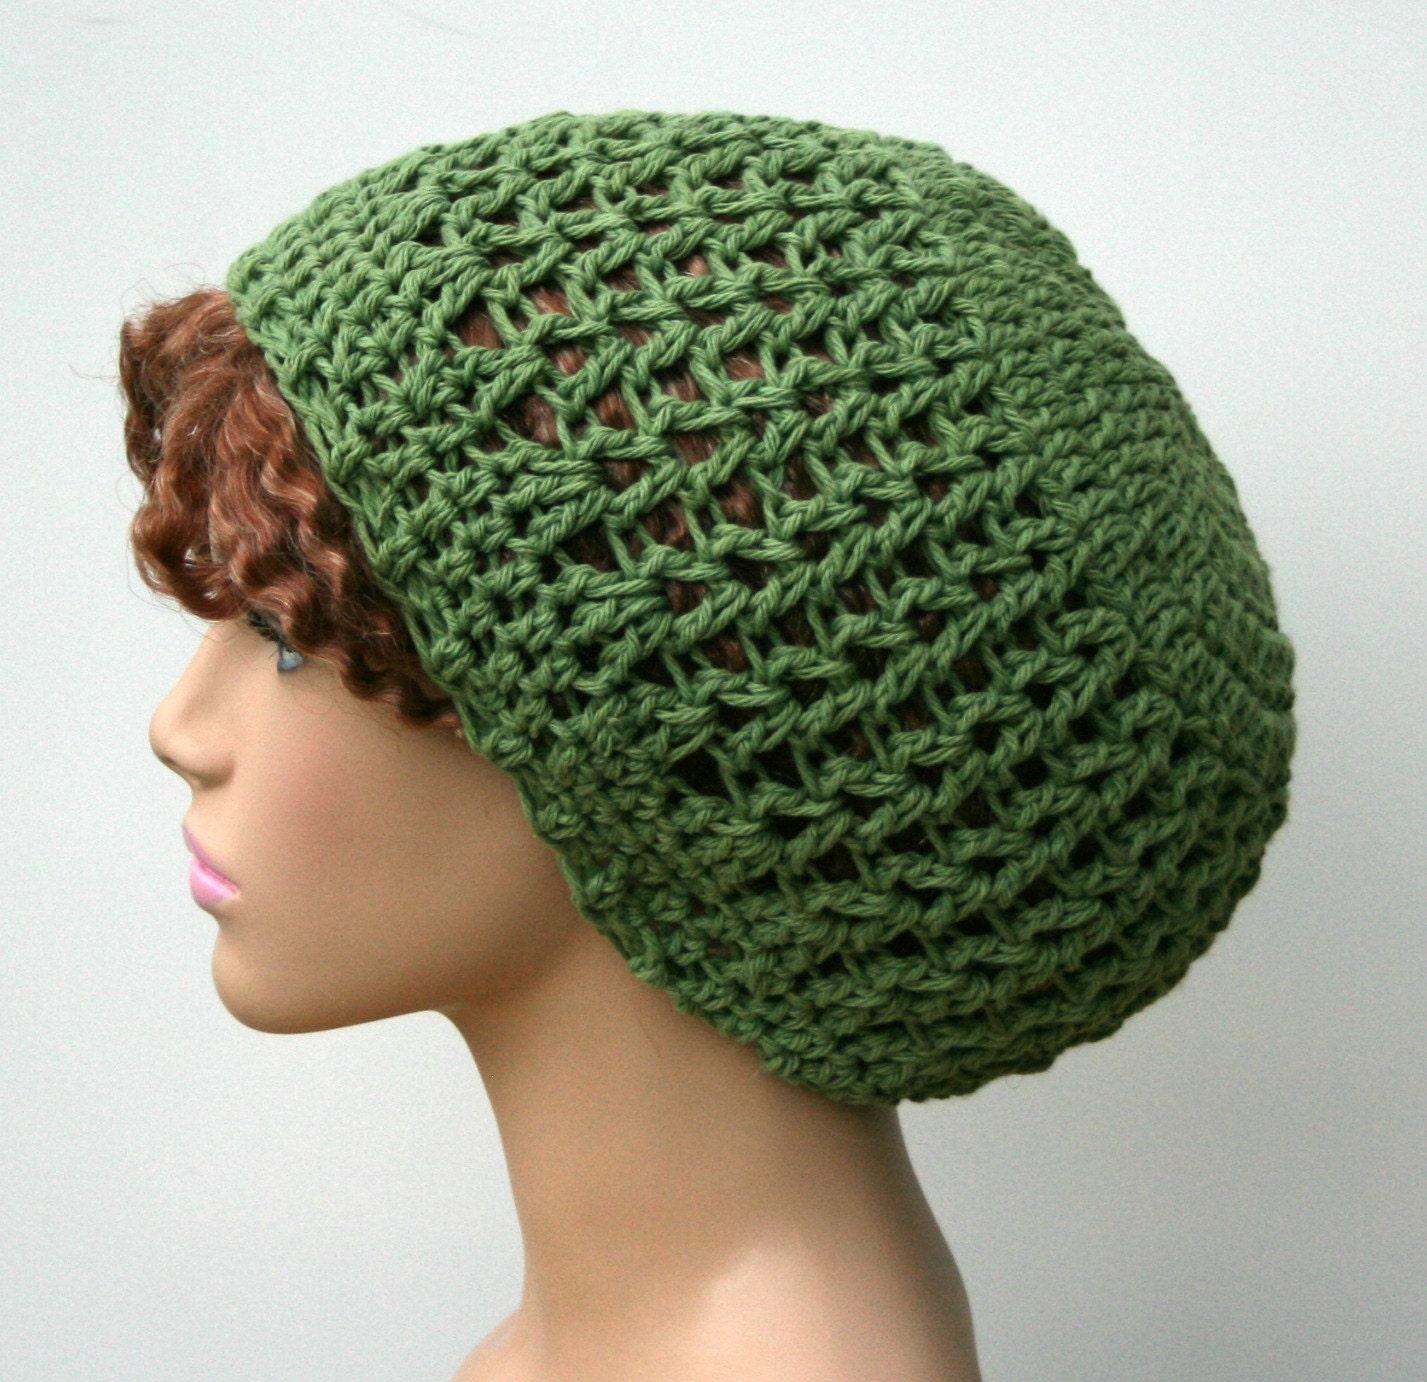 Crochet Slouch Hat: Crochet Slouchy Hat Slouchy Beanie Hat Cotton Beanie Small